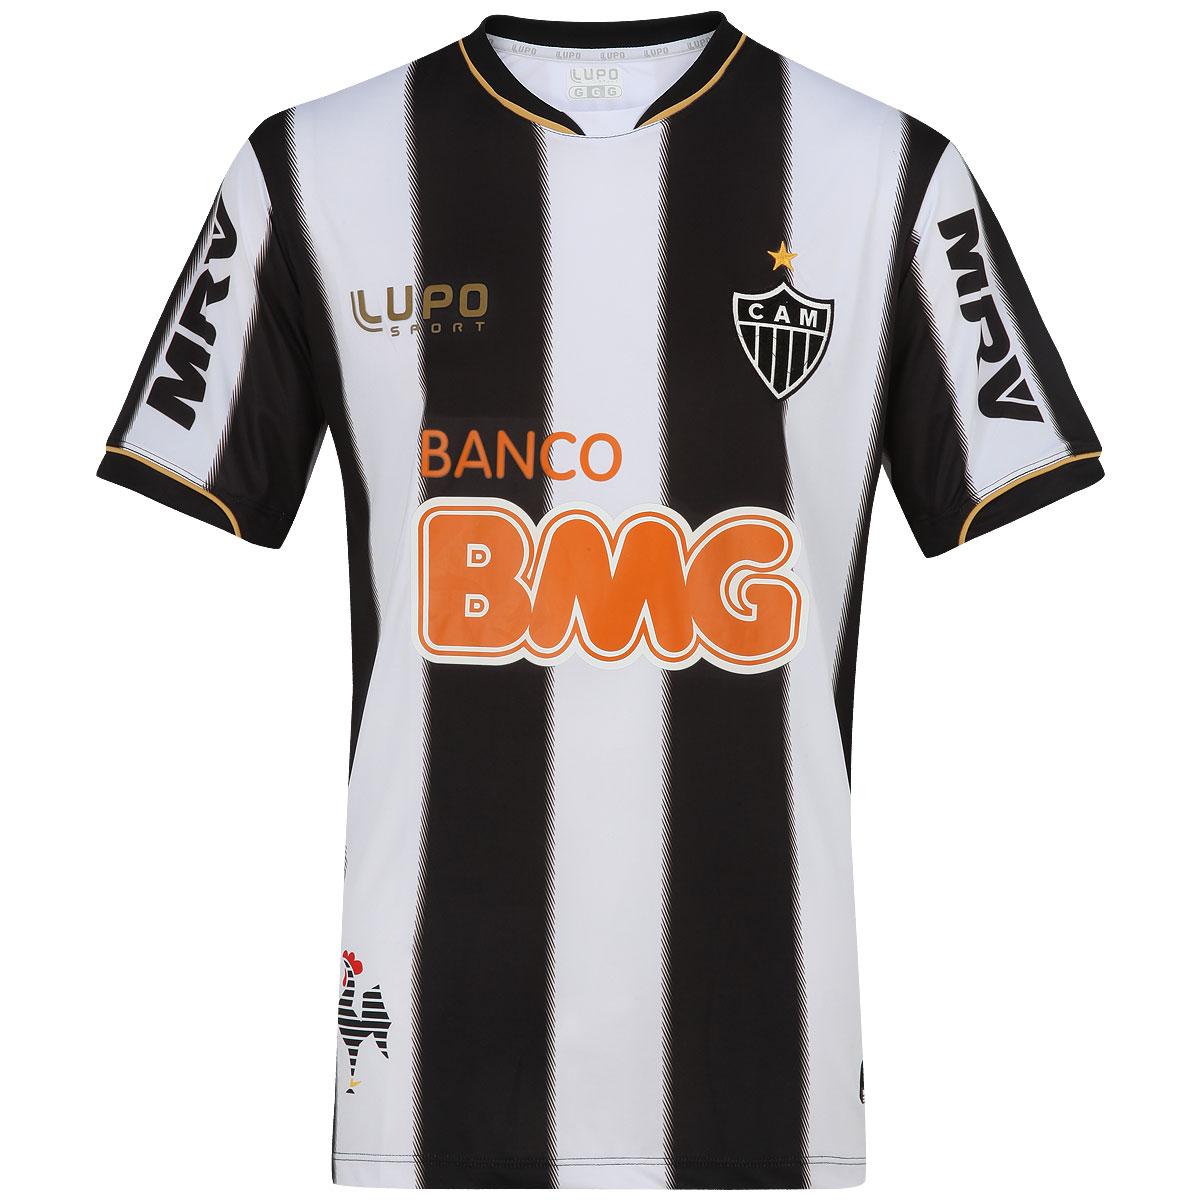 Camisa Atletico Mineiro 2013 Lupo Camisa Doze